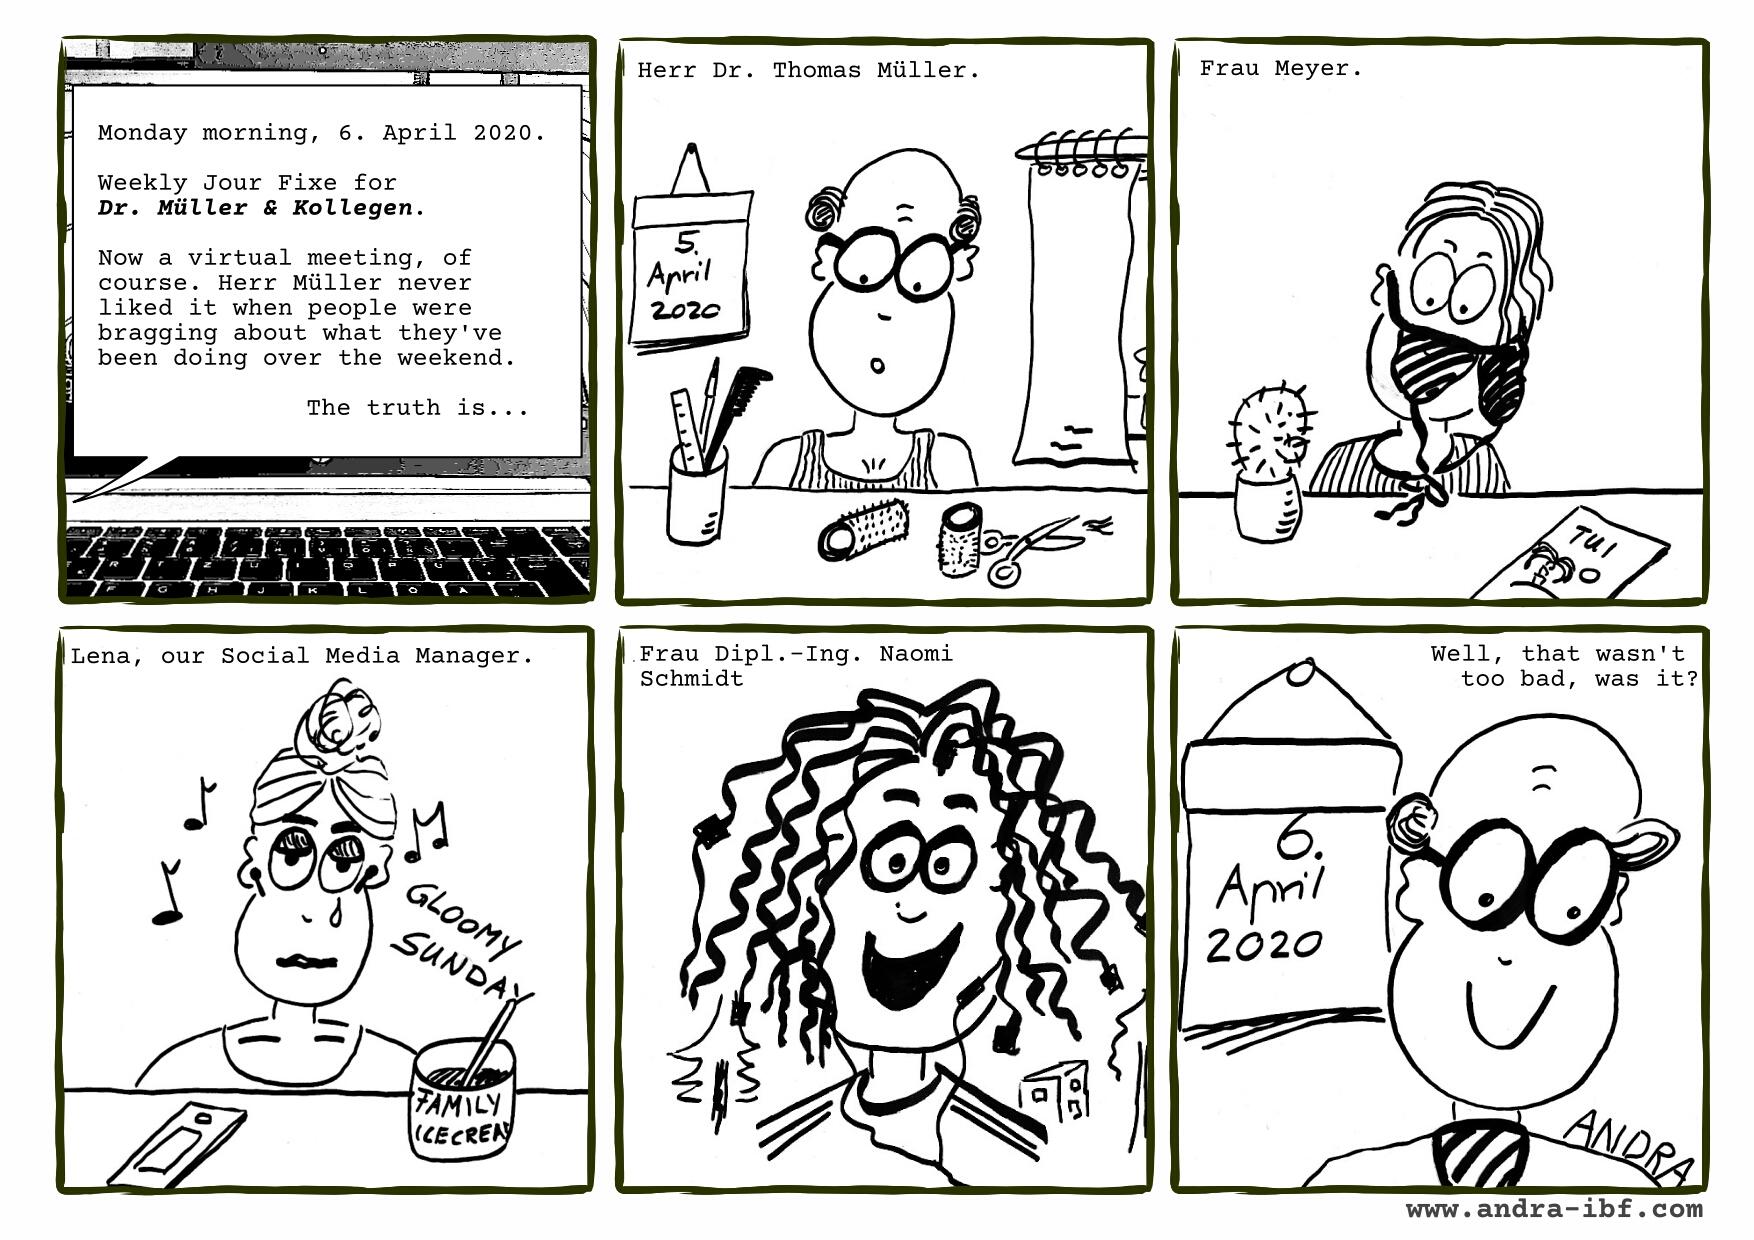 Corona Comic by Andra Riemhofer